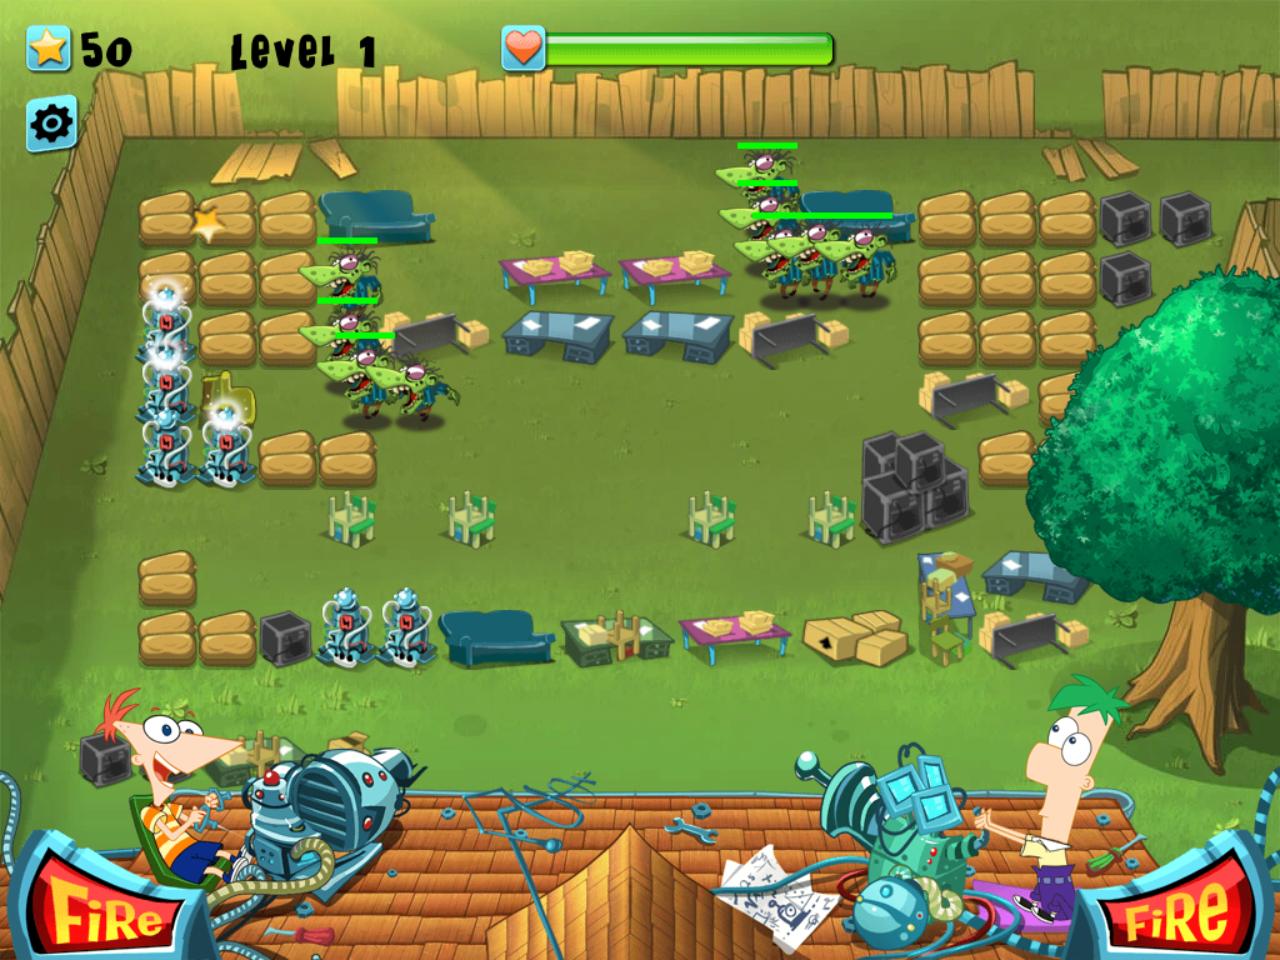 Phineas and Ferb Backyard Defense Game Play Screenshot.